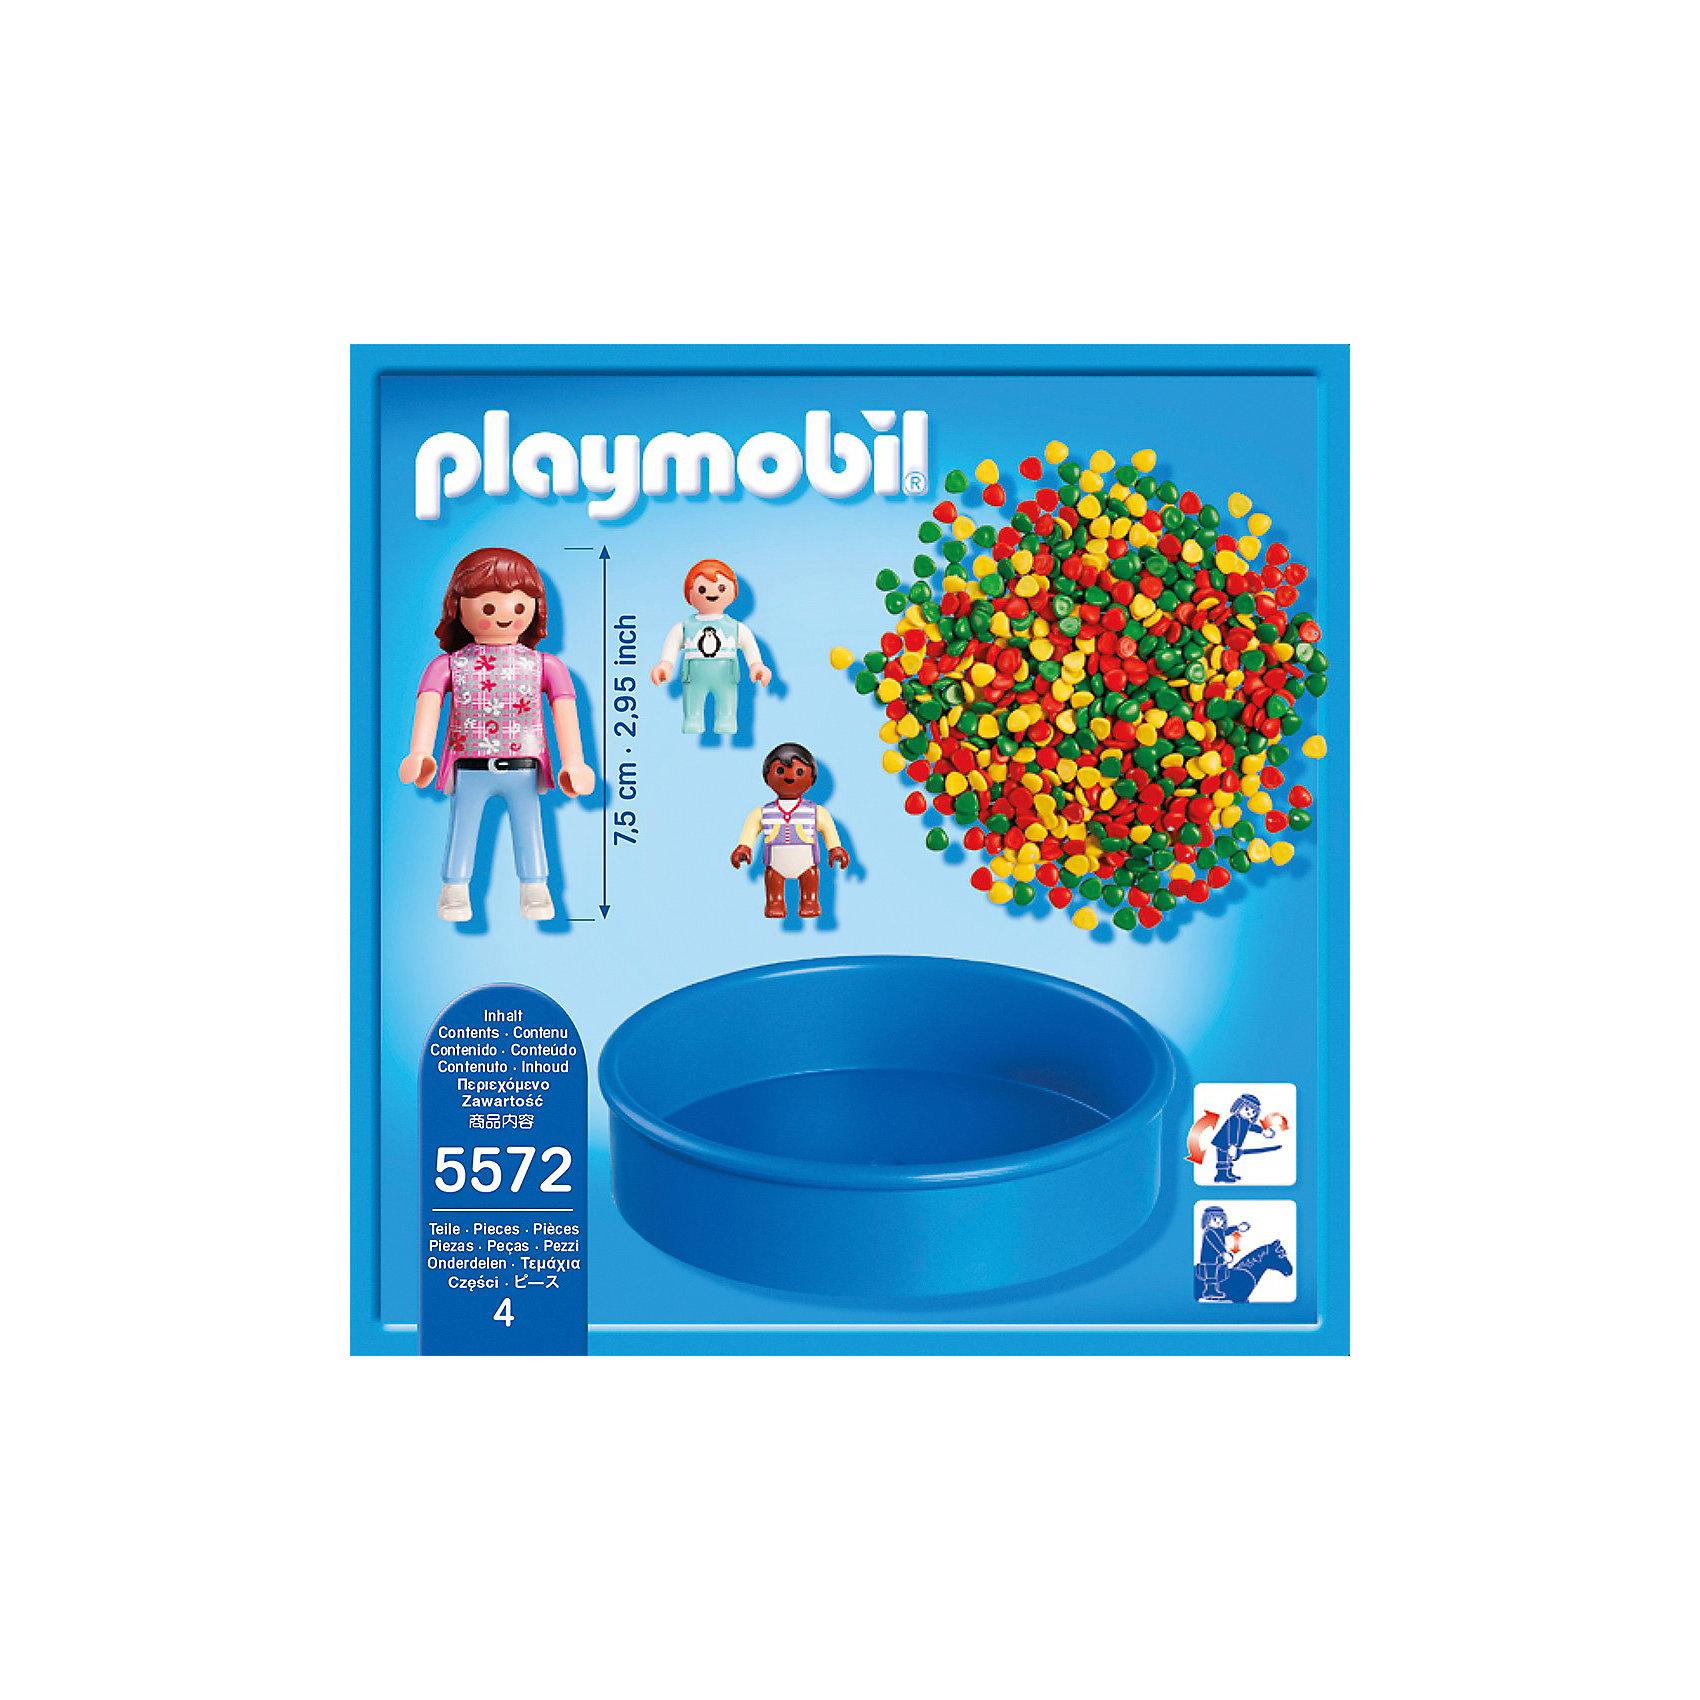 PLAYMOBIL 5572 ������� ���: ������� �������� � �������� (PLAYMOBIL�)